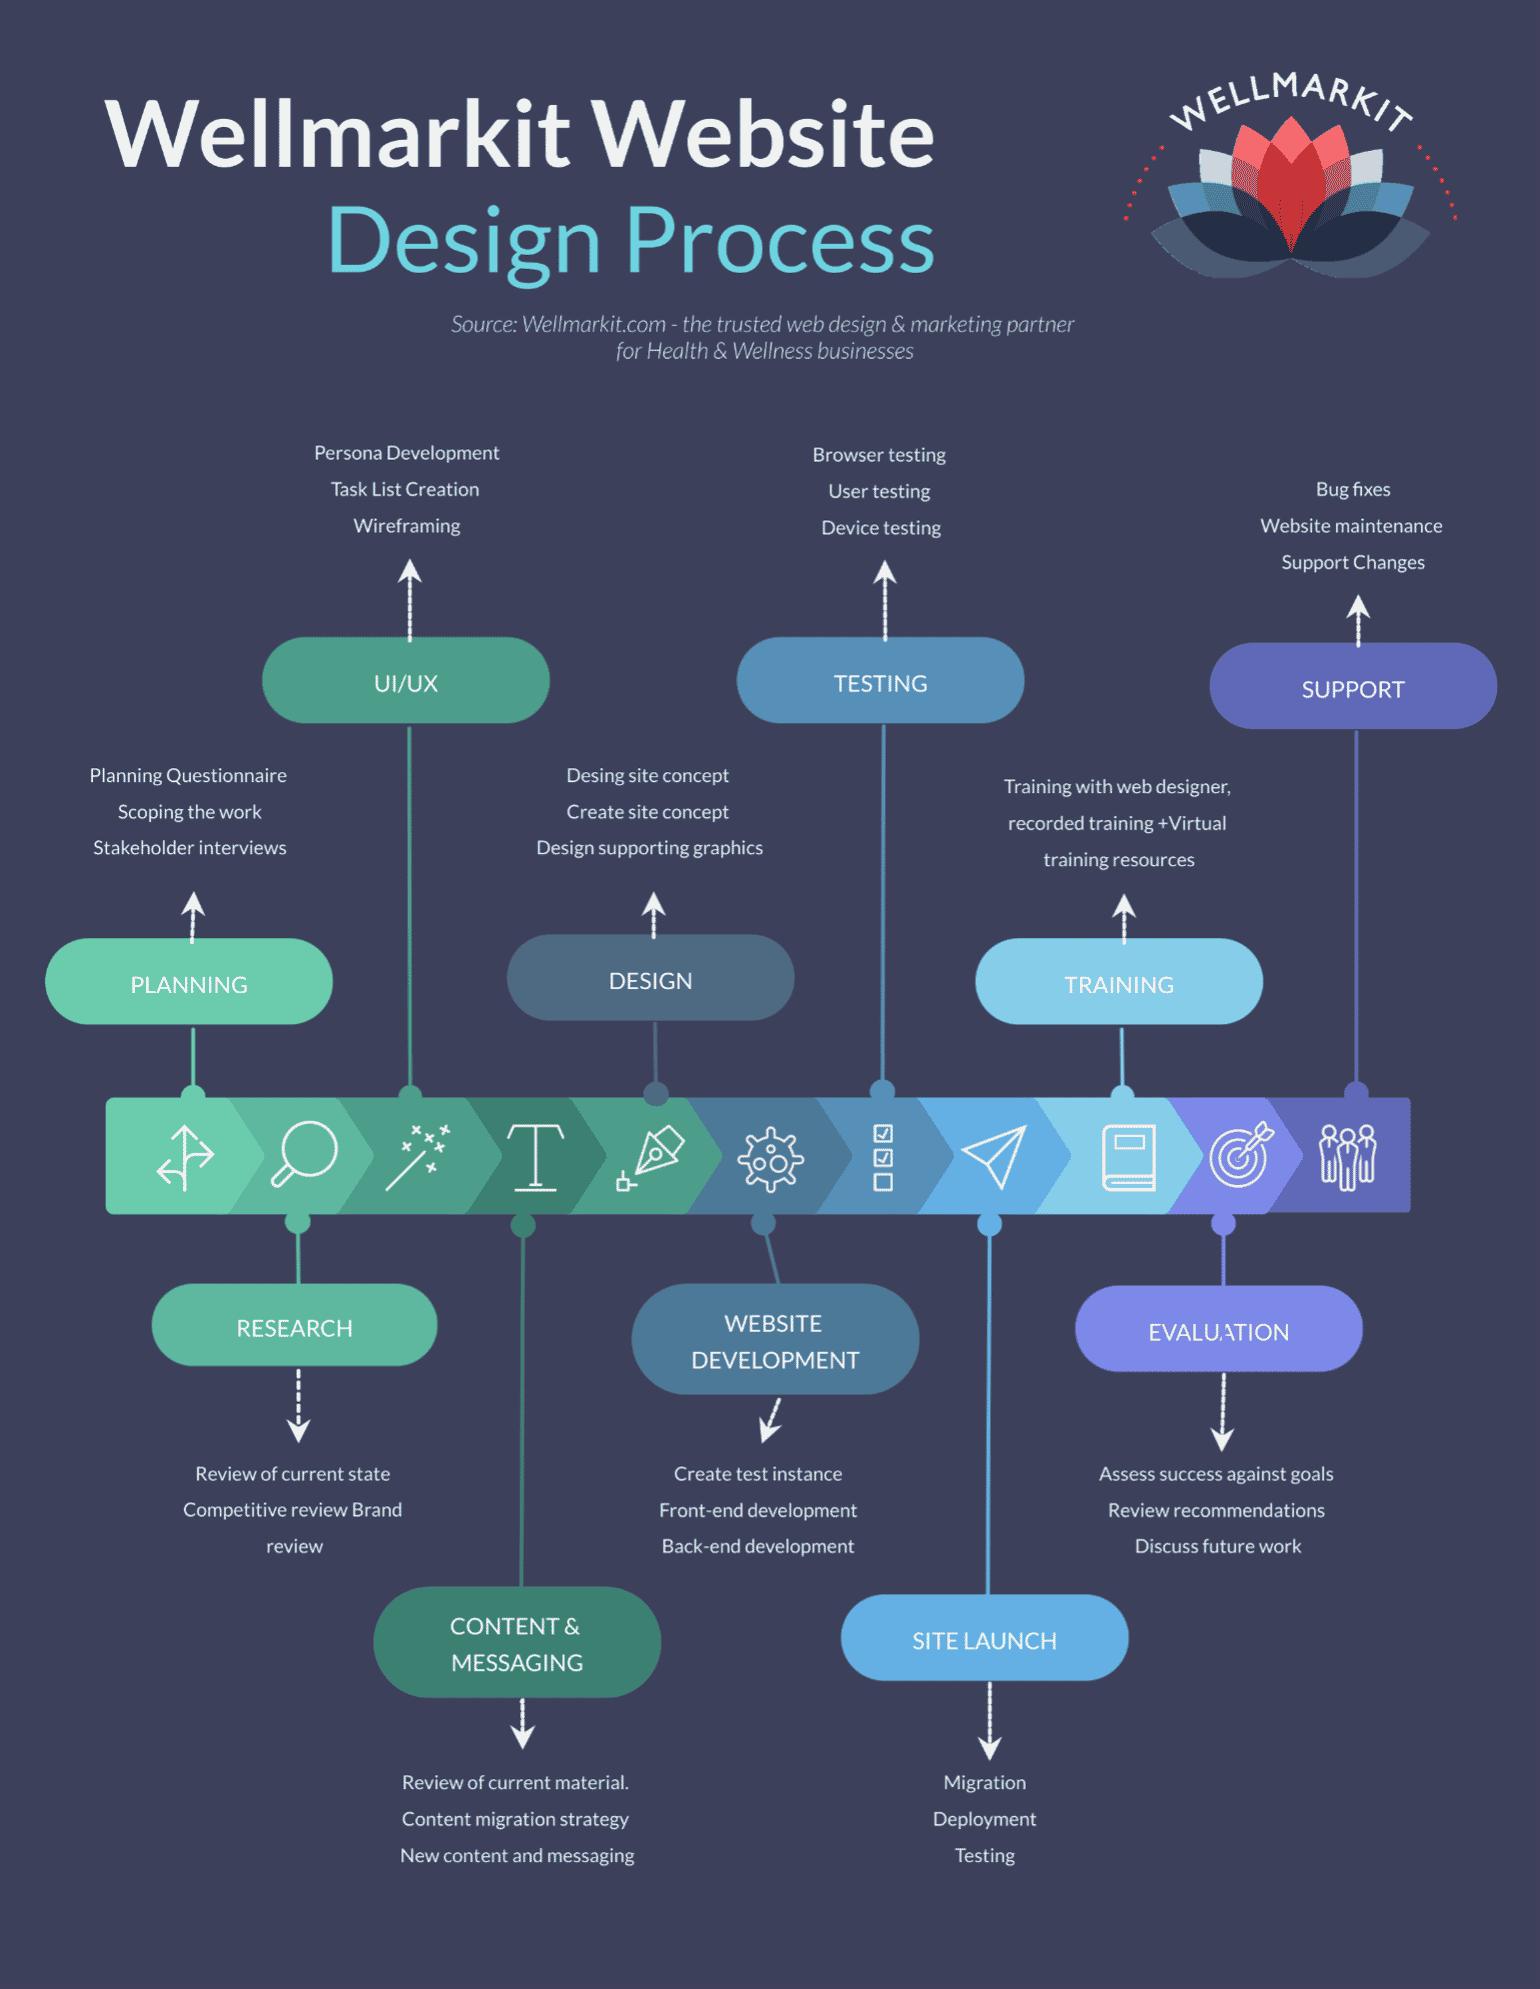 Wellmarkit web design timeline